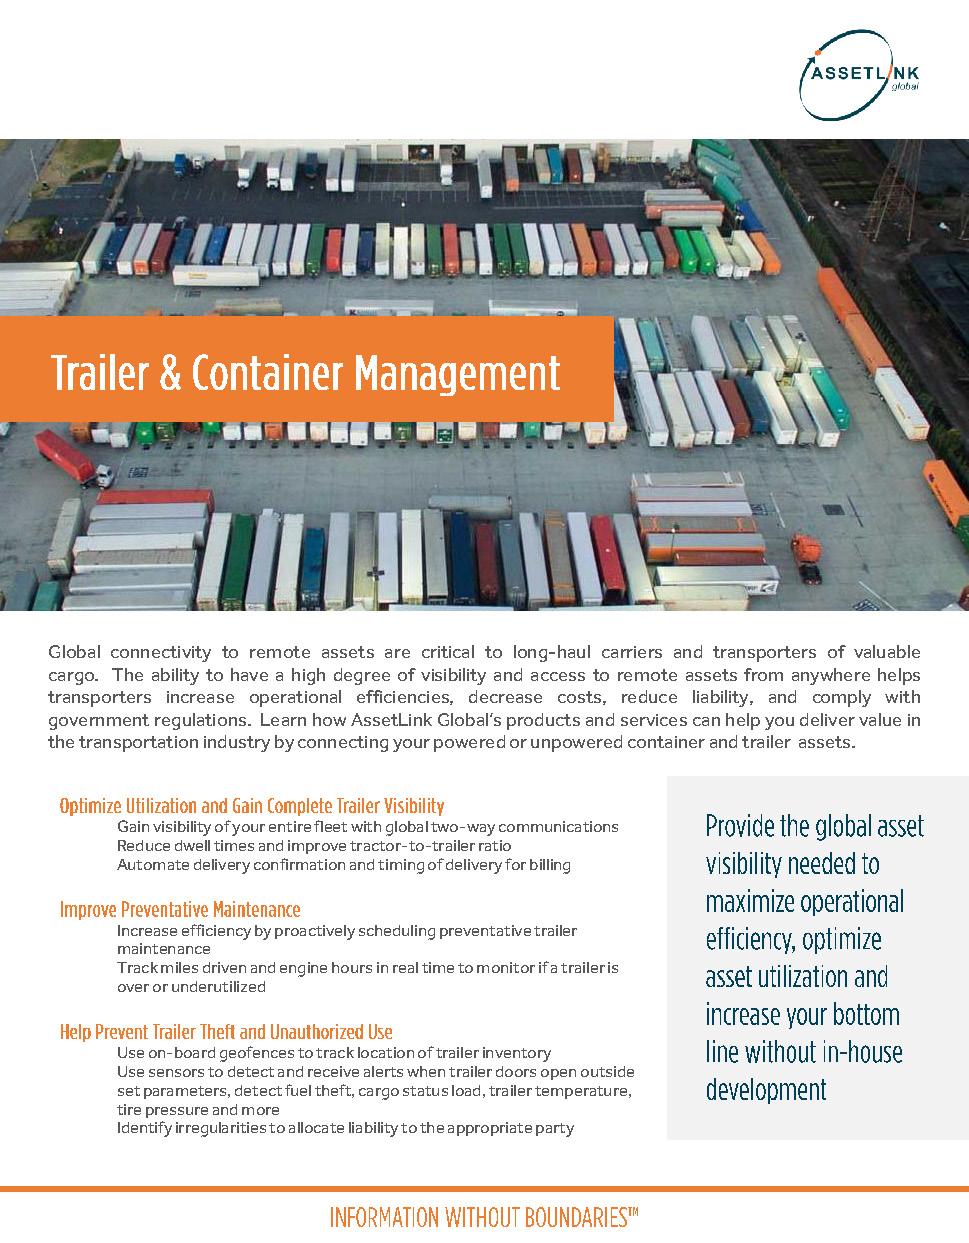 Trailer & Container Management